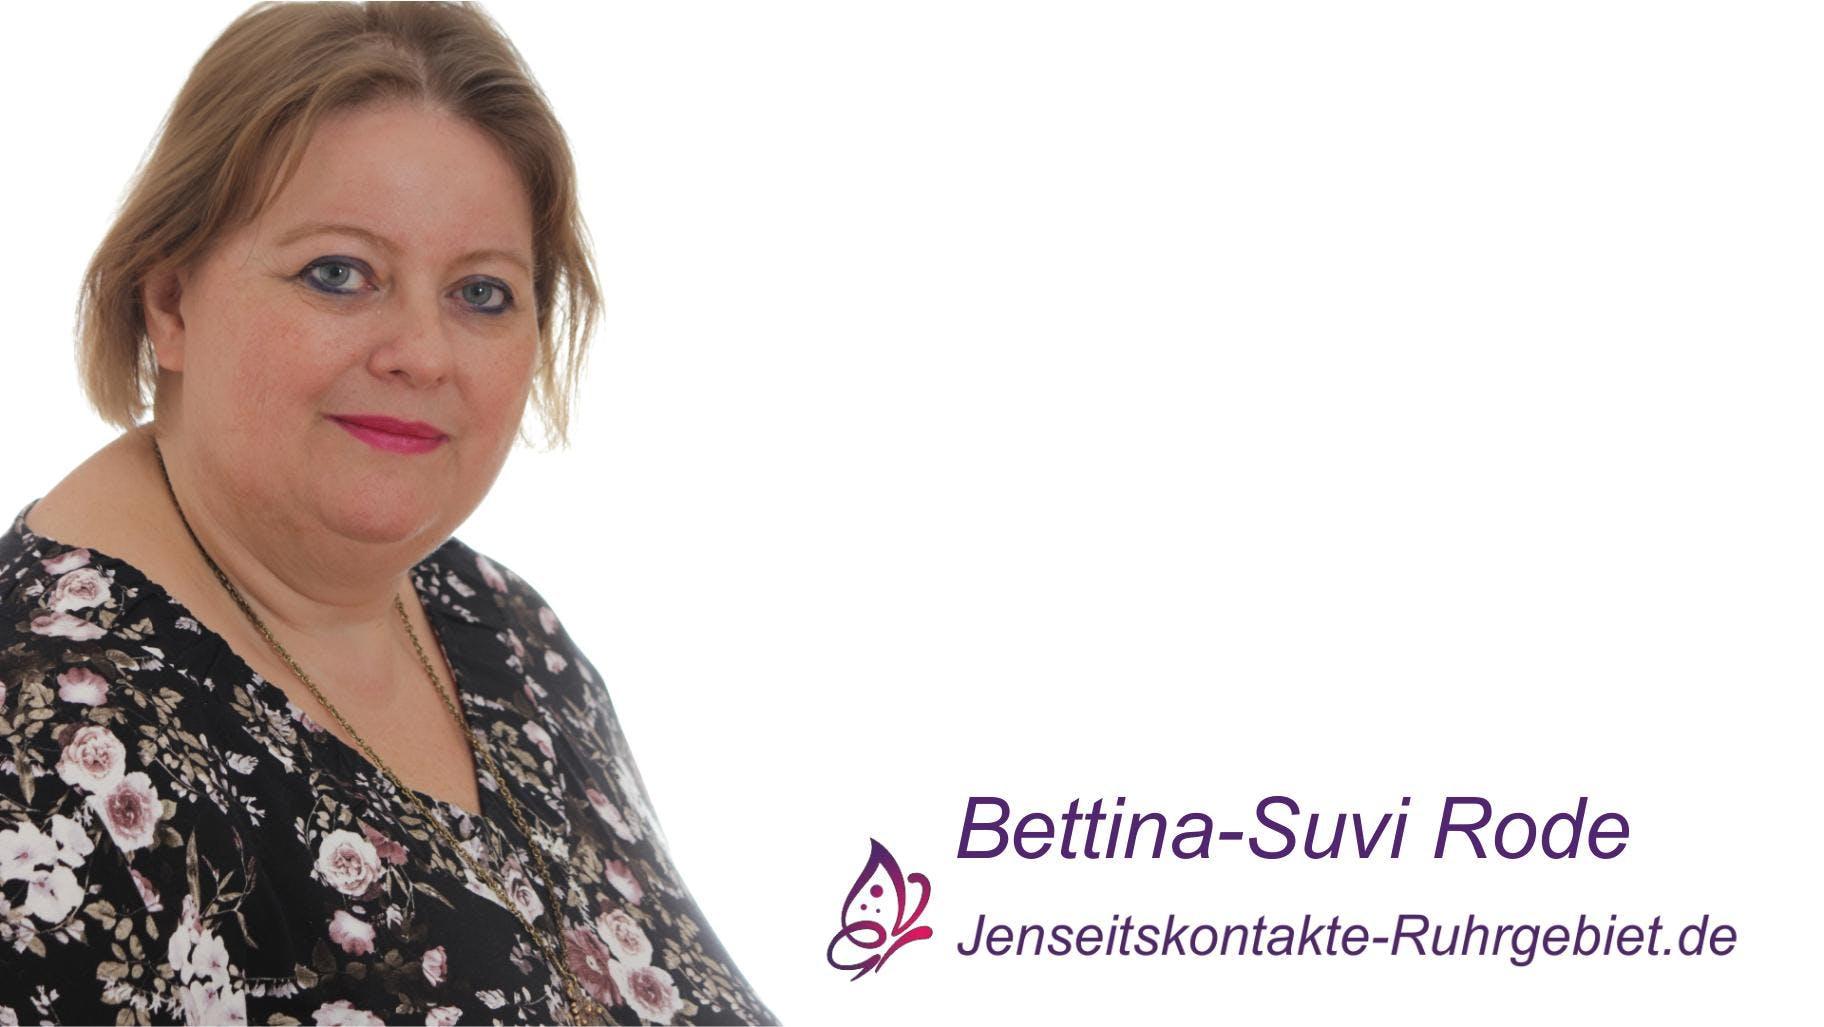 Jenseitskontakt als Privatsitzung mit Bettina